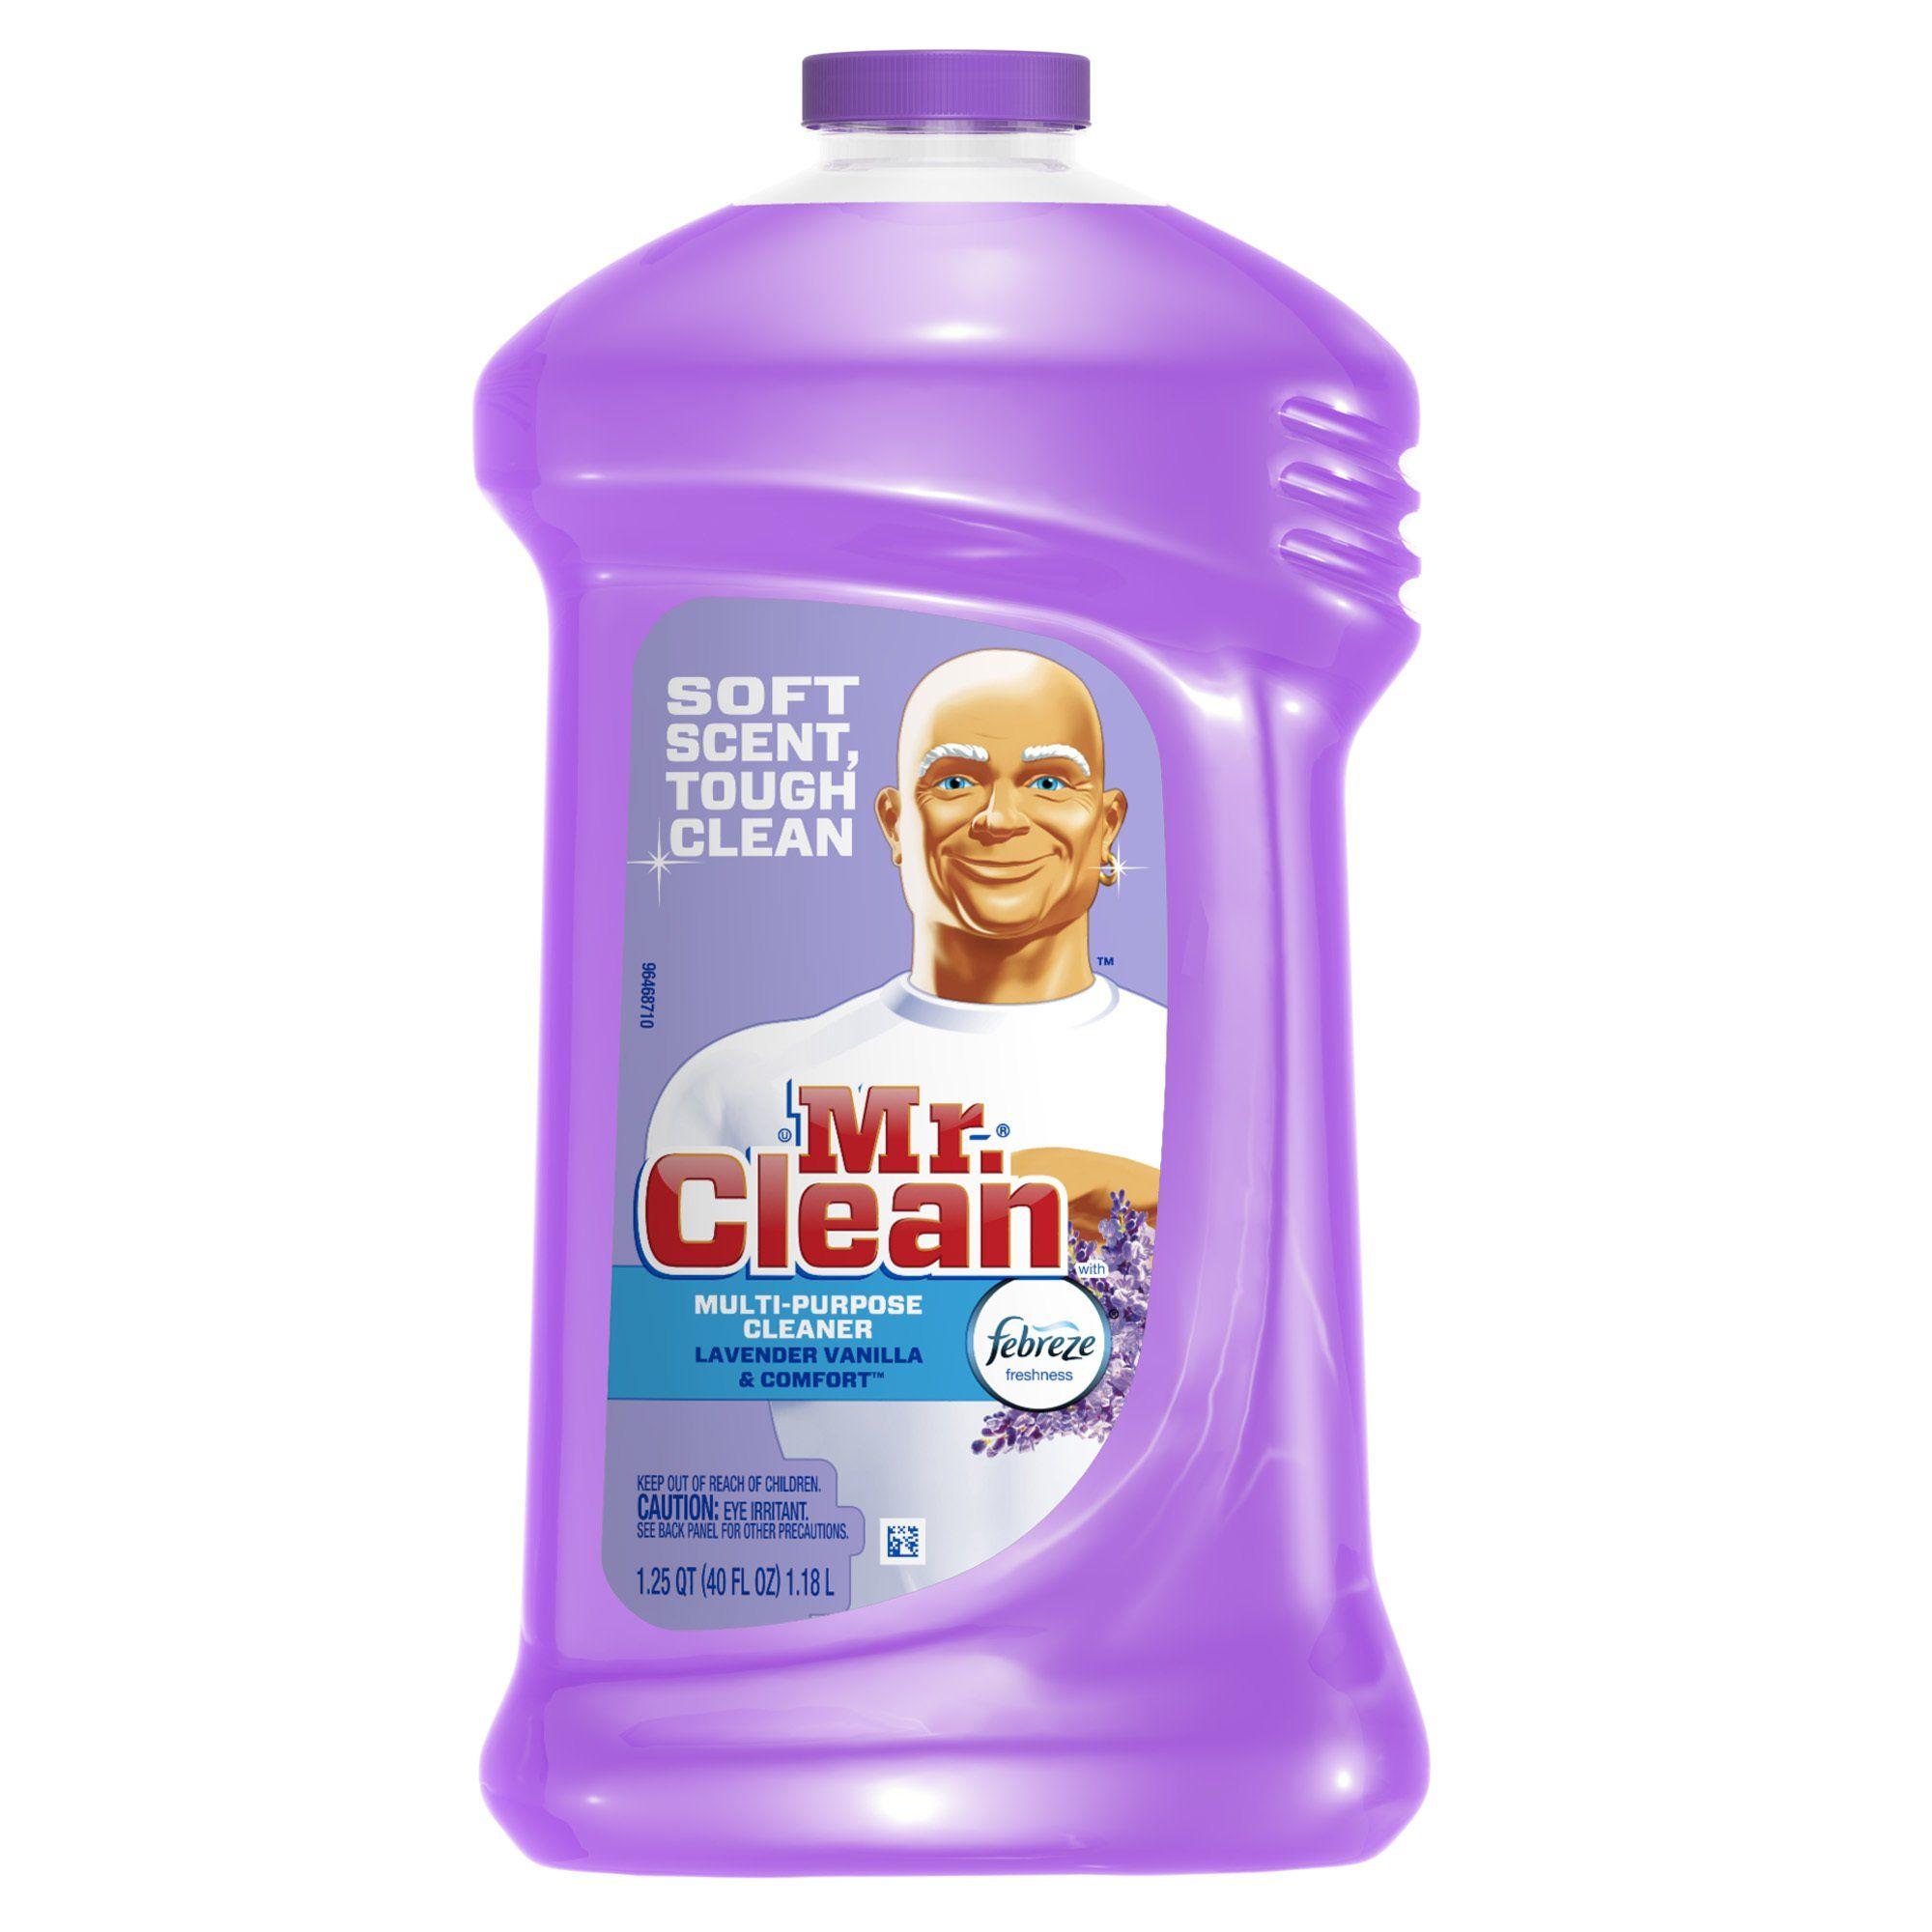 71ds3qg49zl Sl1500 Jpg 1 500 1 500 Pixels Multipurpose Cleaner Best Floor Cleaner Best Cleaning Products